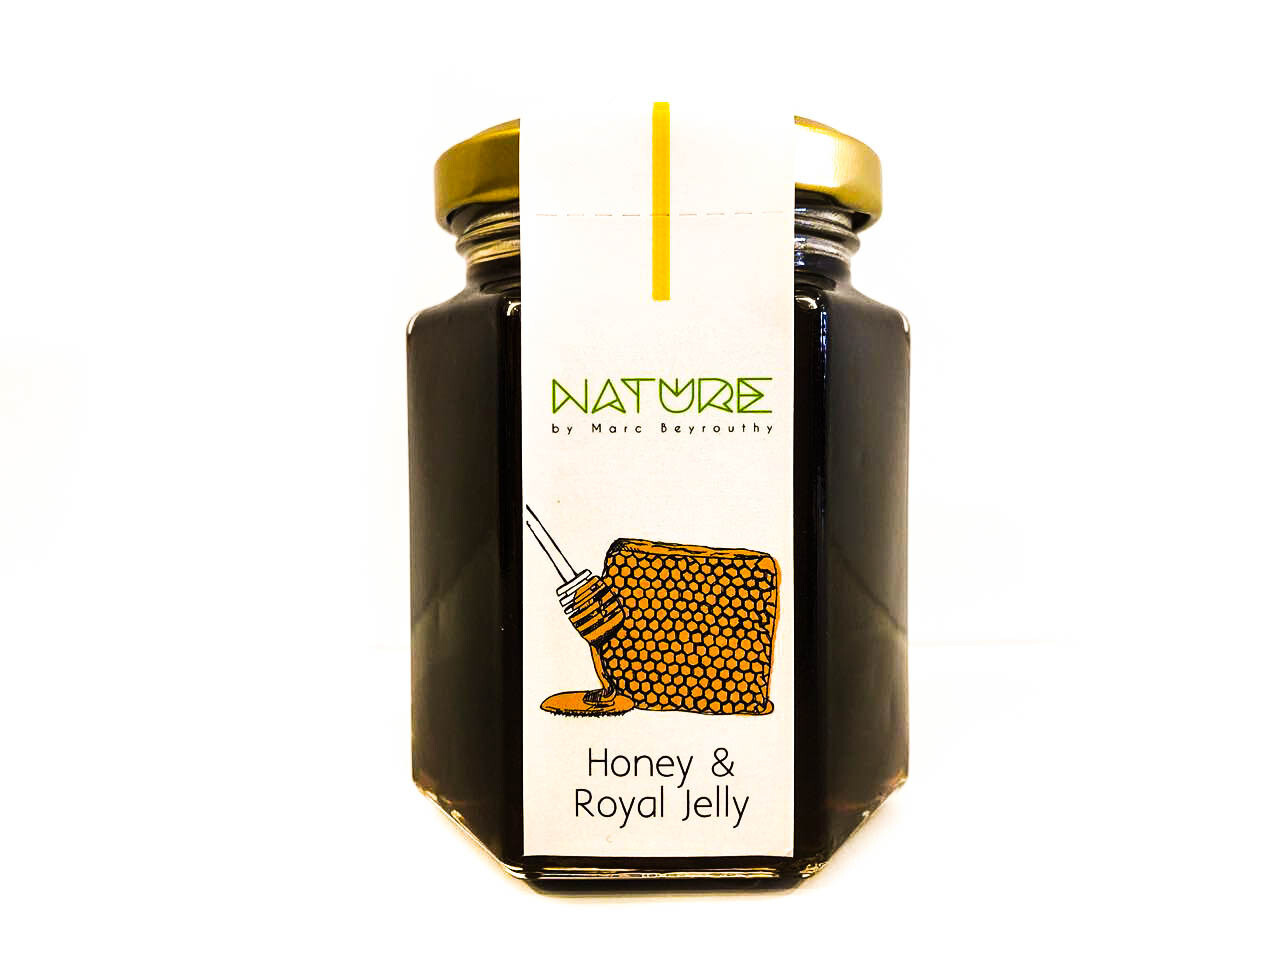 Honey & Royal Jelly العسل و الهلام الملكي (Jar) - Nature by Marc Beyrouthy